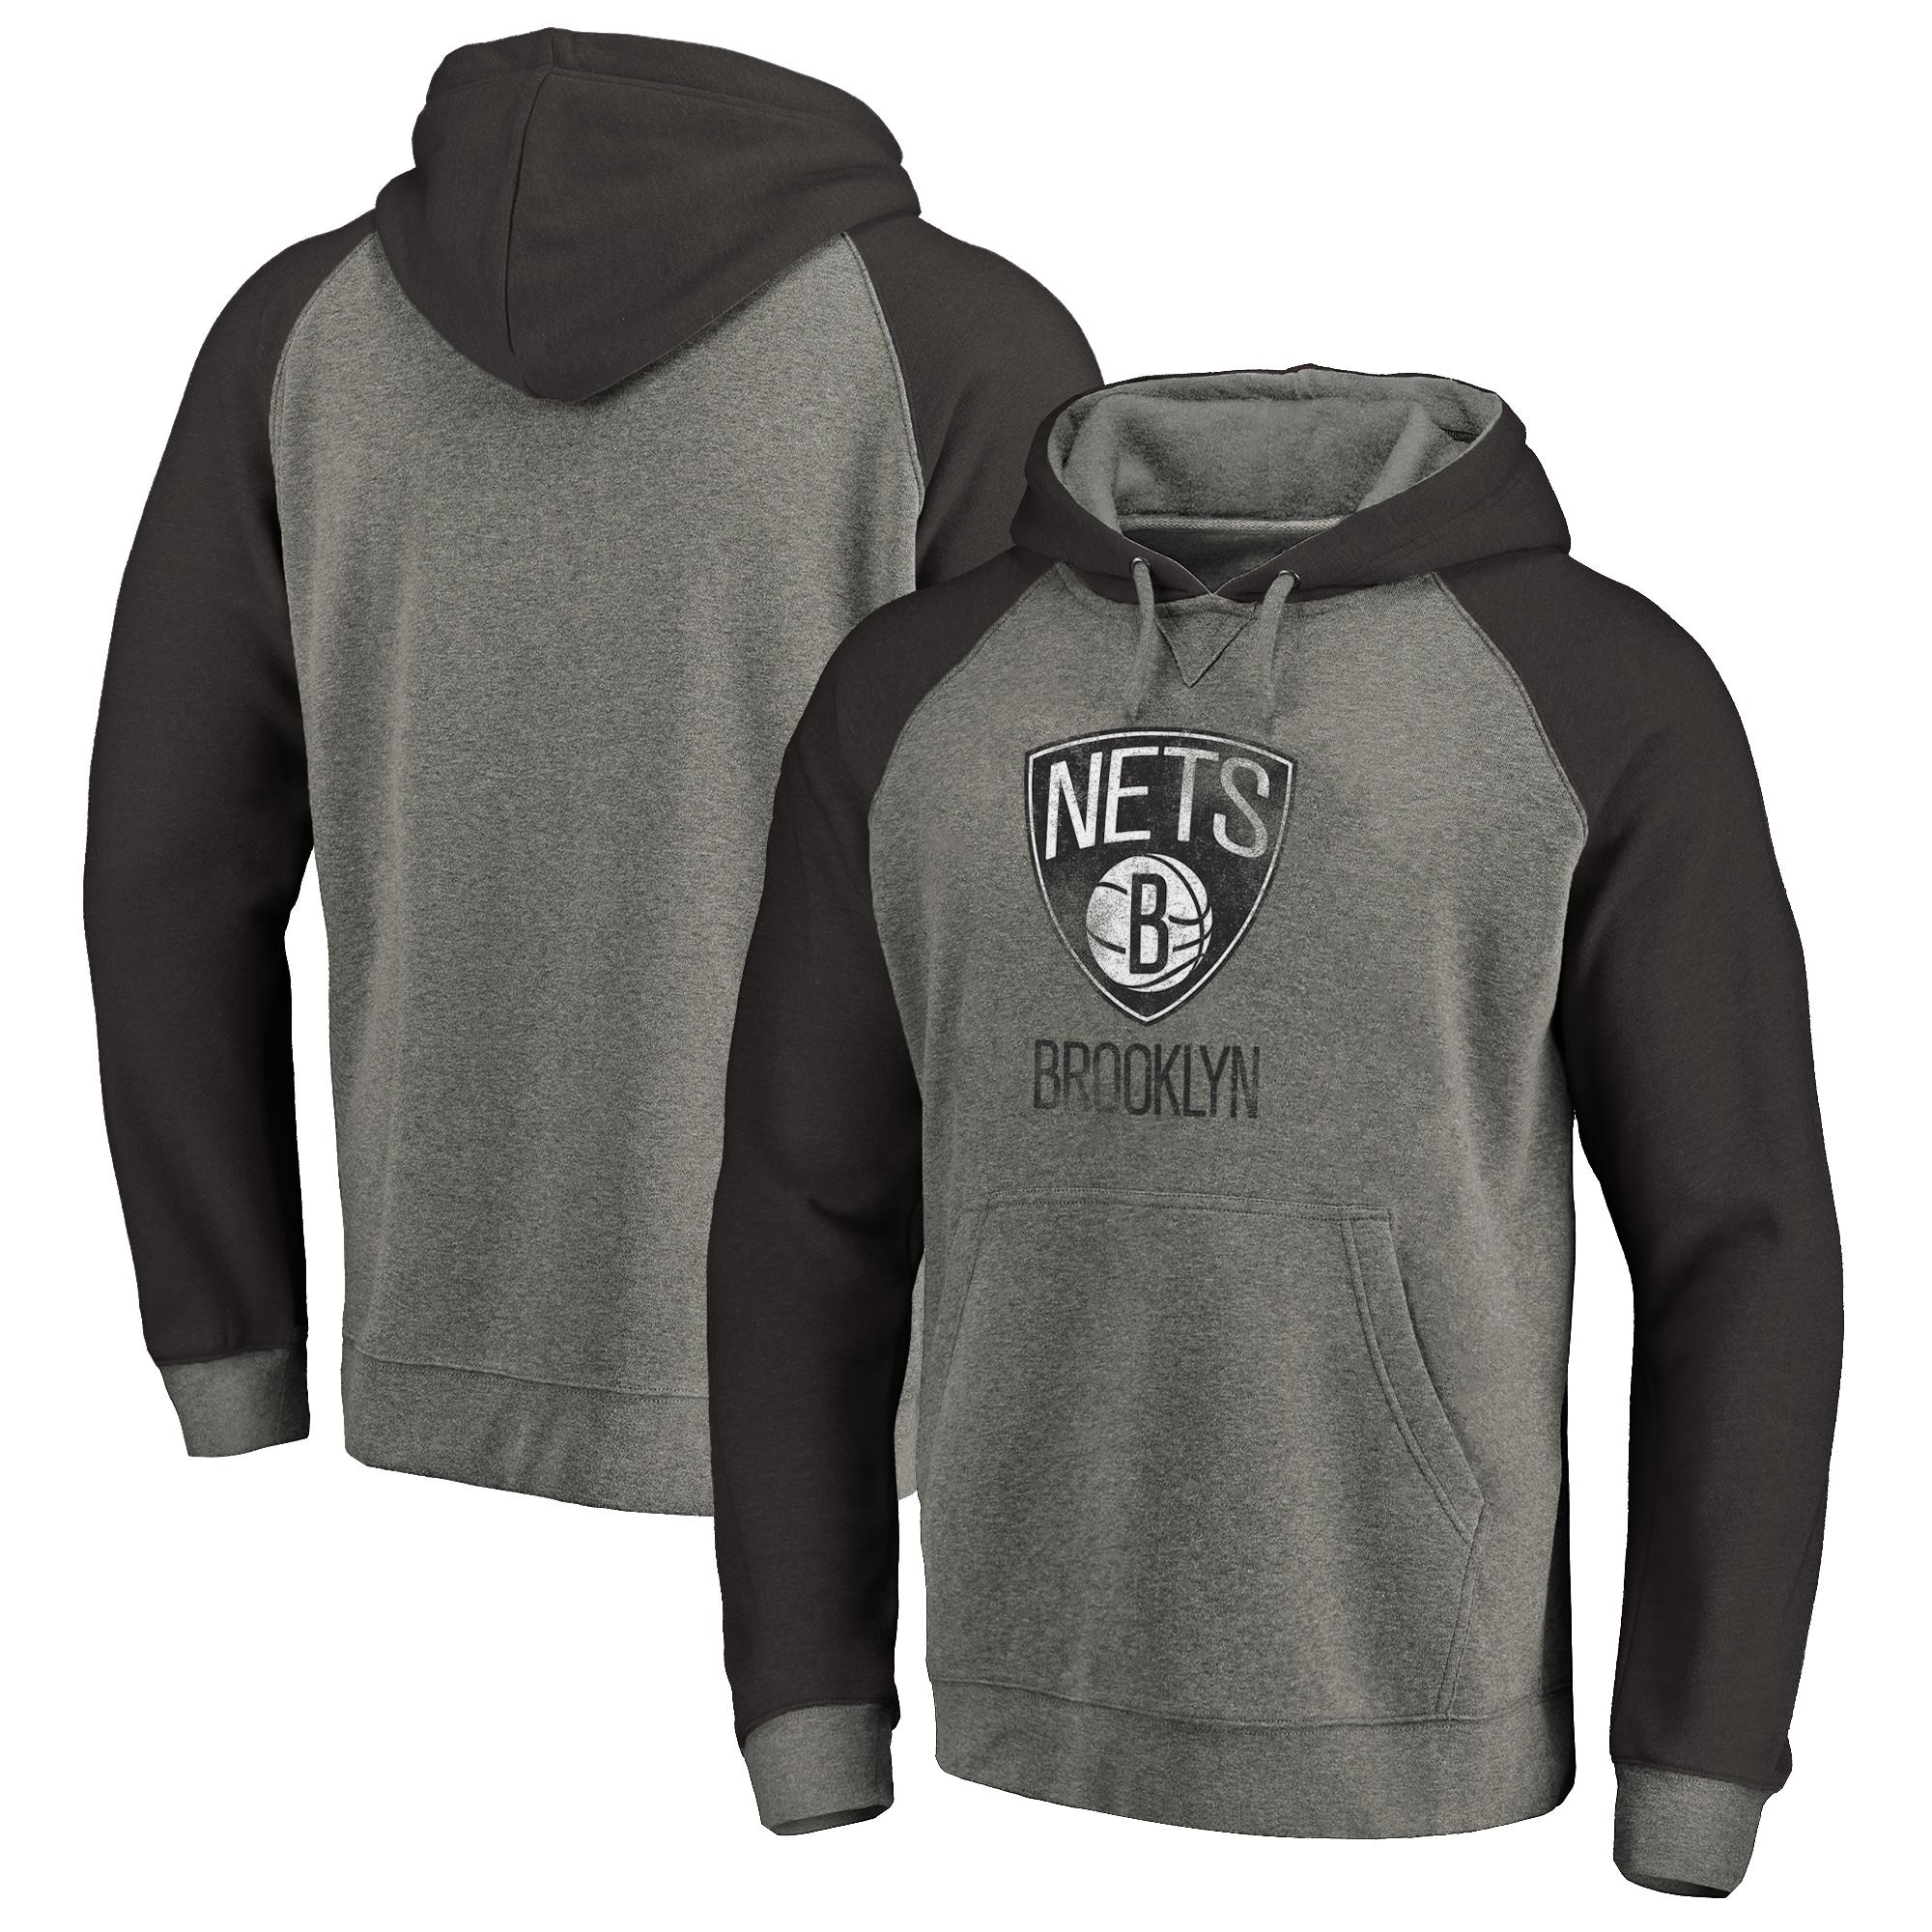 Brooklyn Nets Fanatics Branded Distressed Logo Tri-Blend Pullover Hoodie - Ash/Black